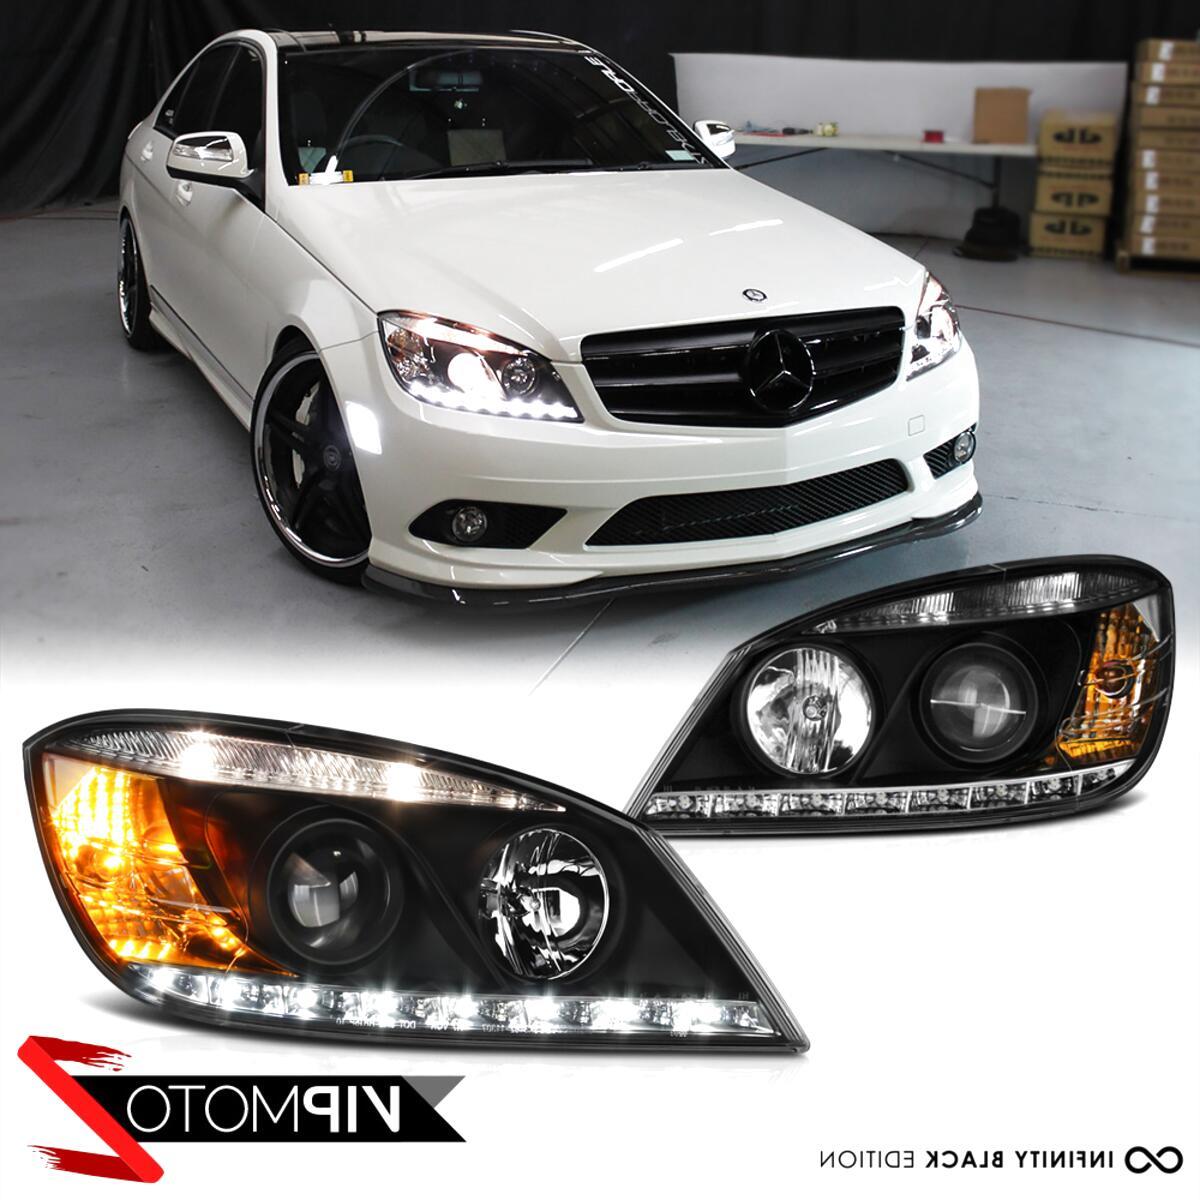 w204 led headlights for sale